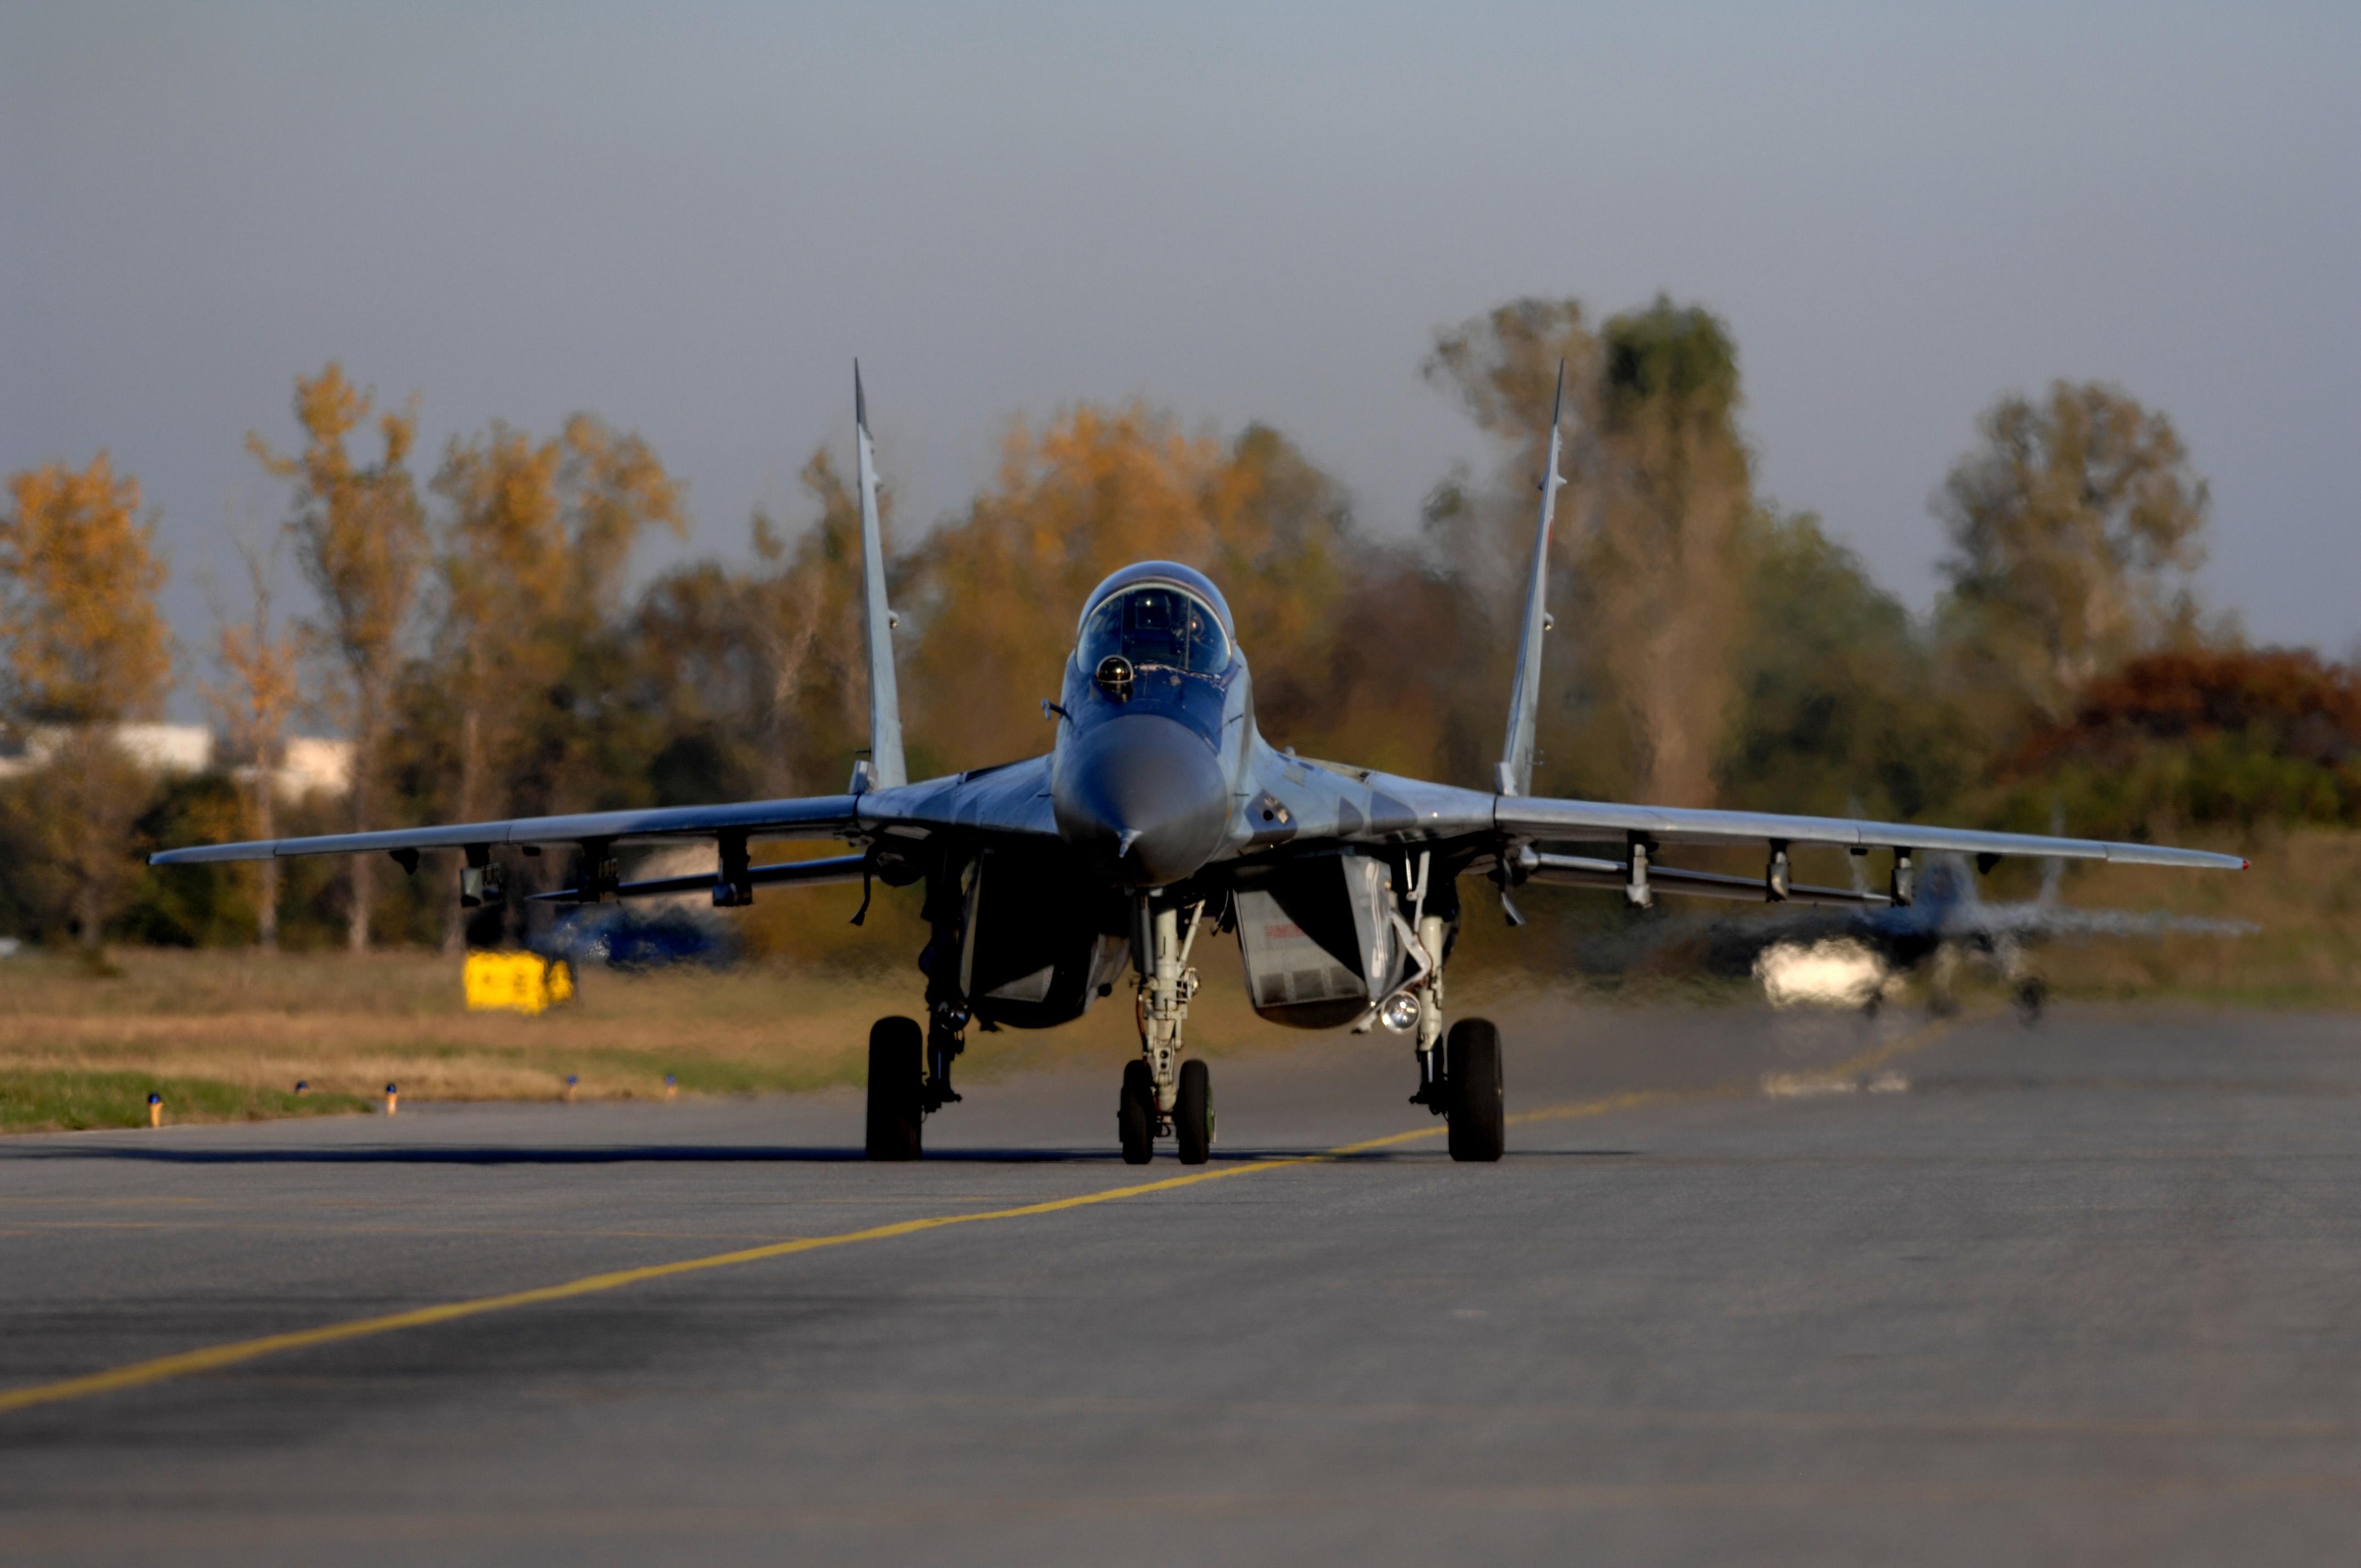 https://upload.wikimedia.org/wikipedia/commons/1/12/Bulgarian_MiG-29_Rodopi_Javelin_2007.jpg